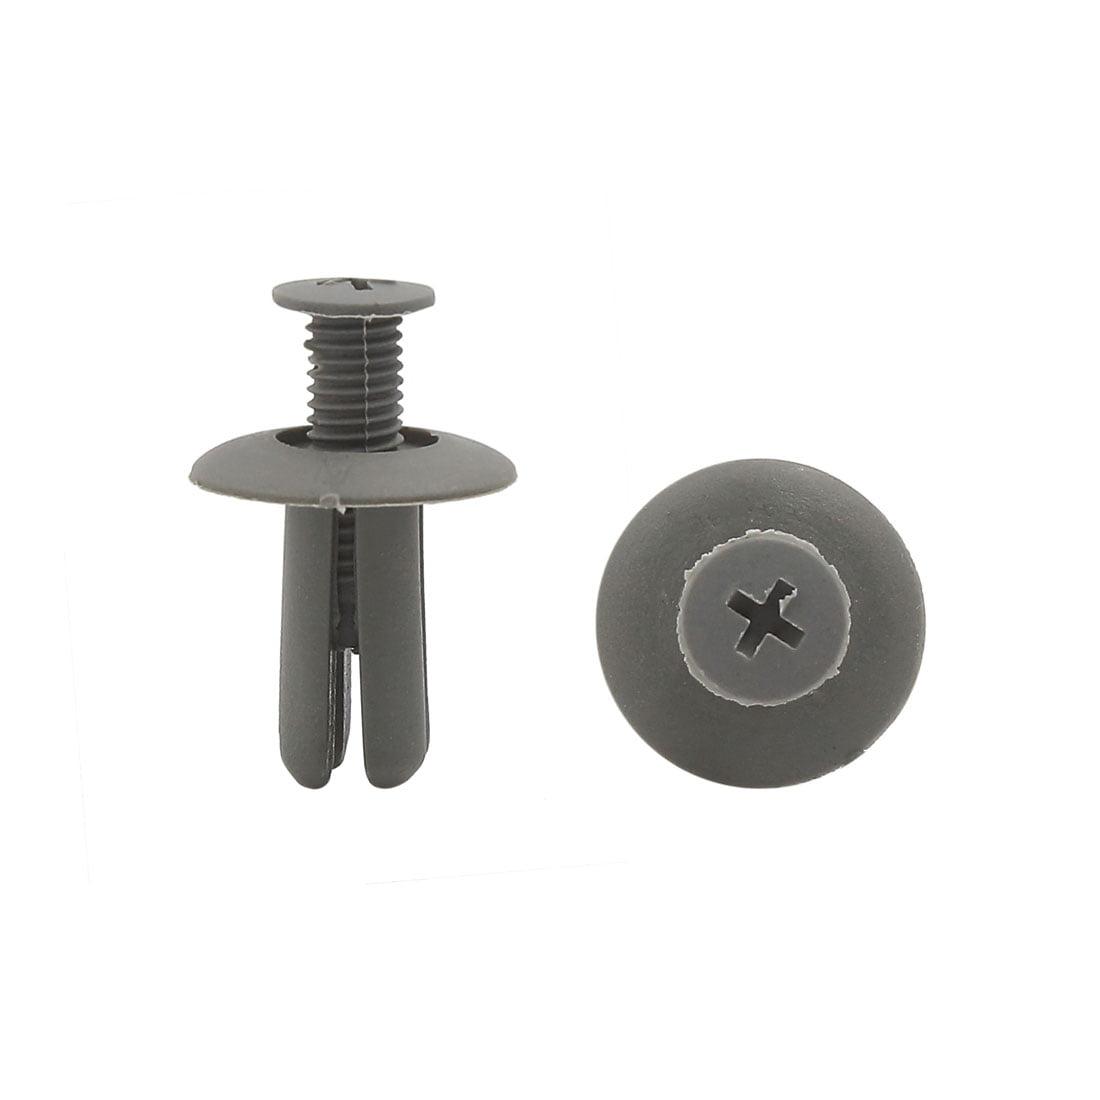 20pcs 8mm Gray Car Plastic Push Type Rivet Retainer Fastener Bumper Pin Clips - image 2 de 2